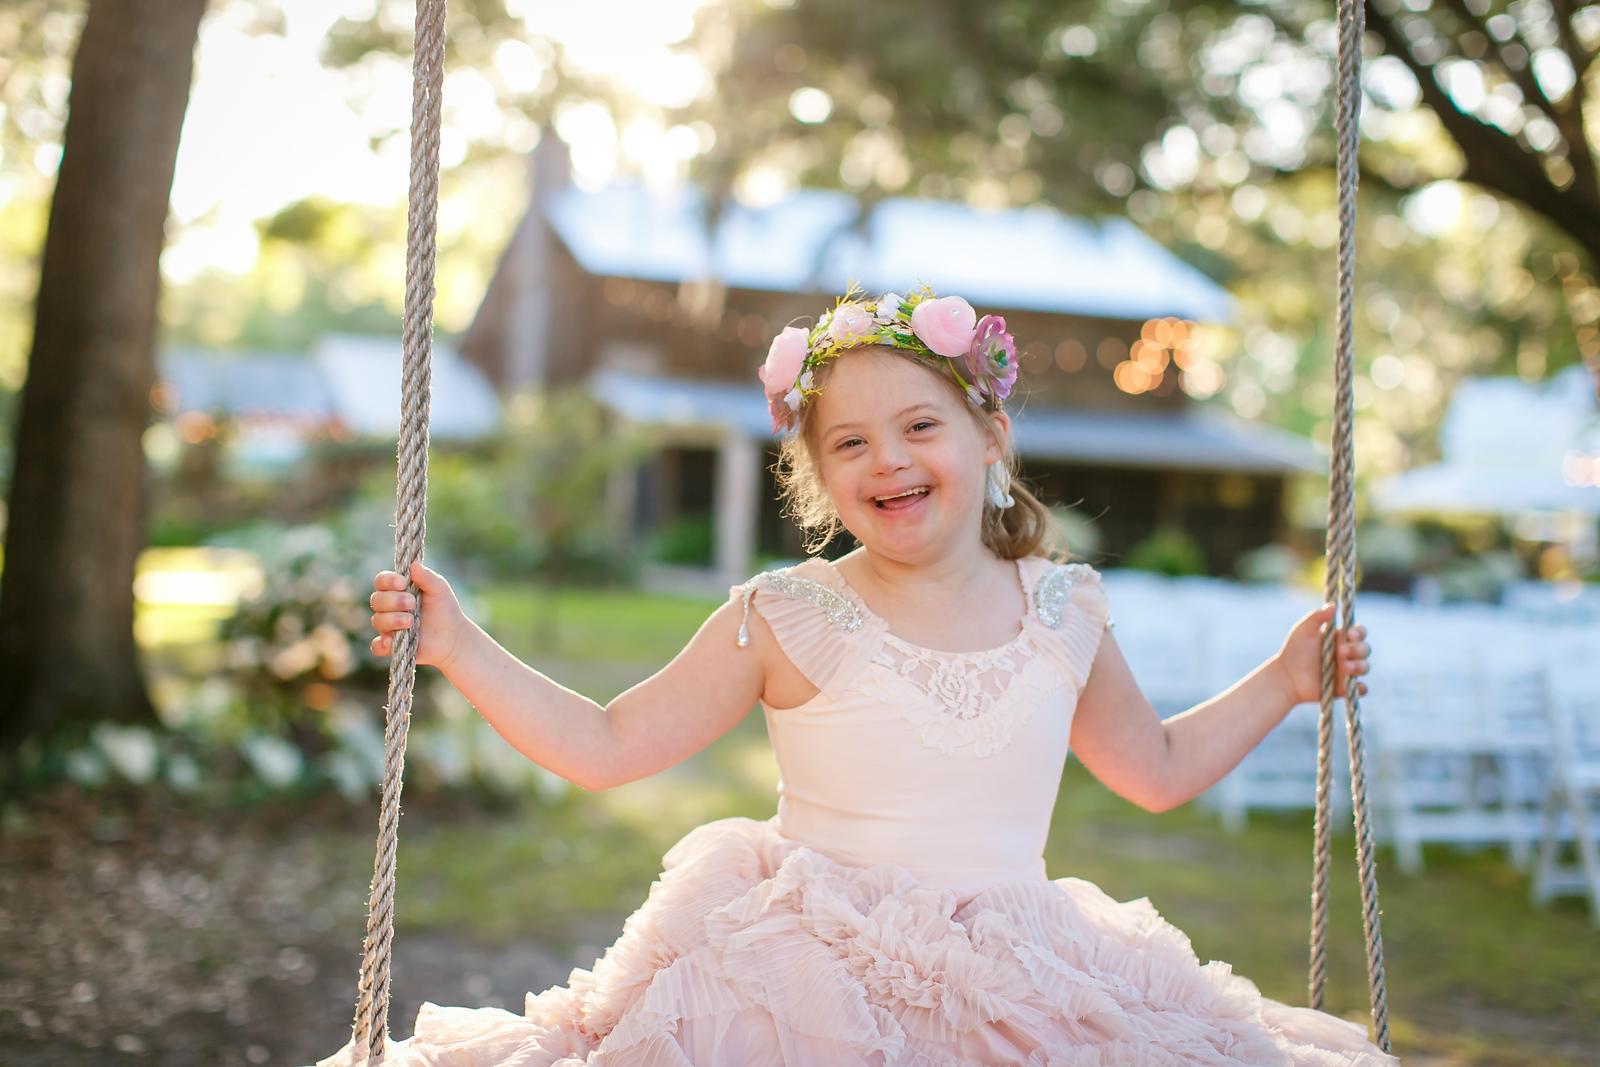 CAP2017-MadisonKyle-WEDDING-Giselle-TuckersFarmhouse-1041